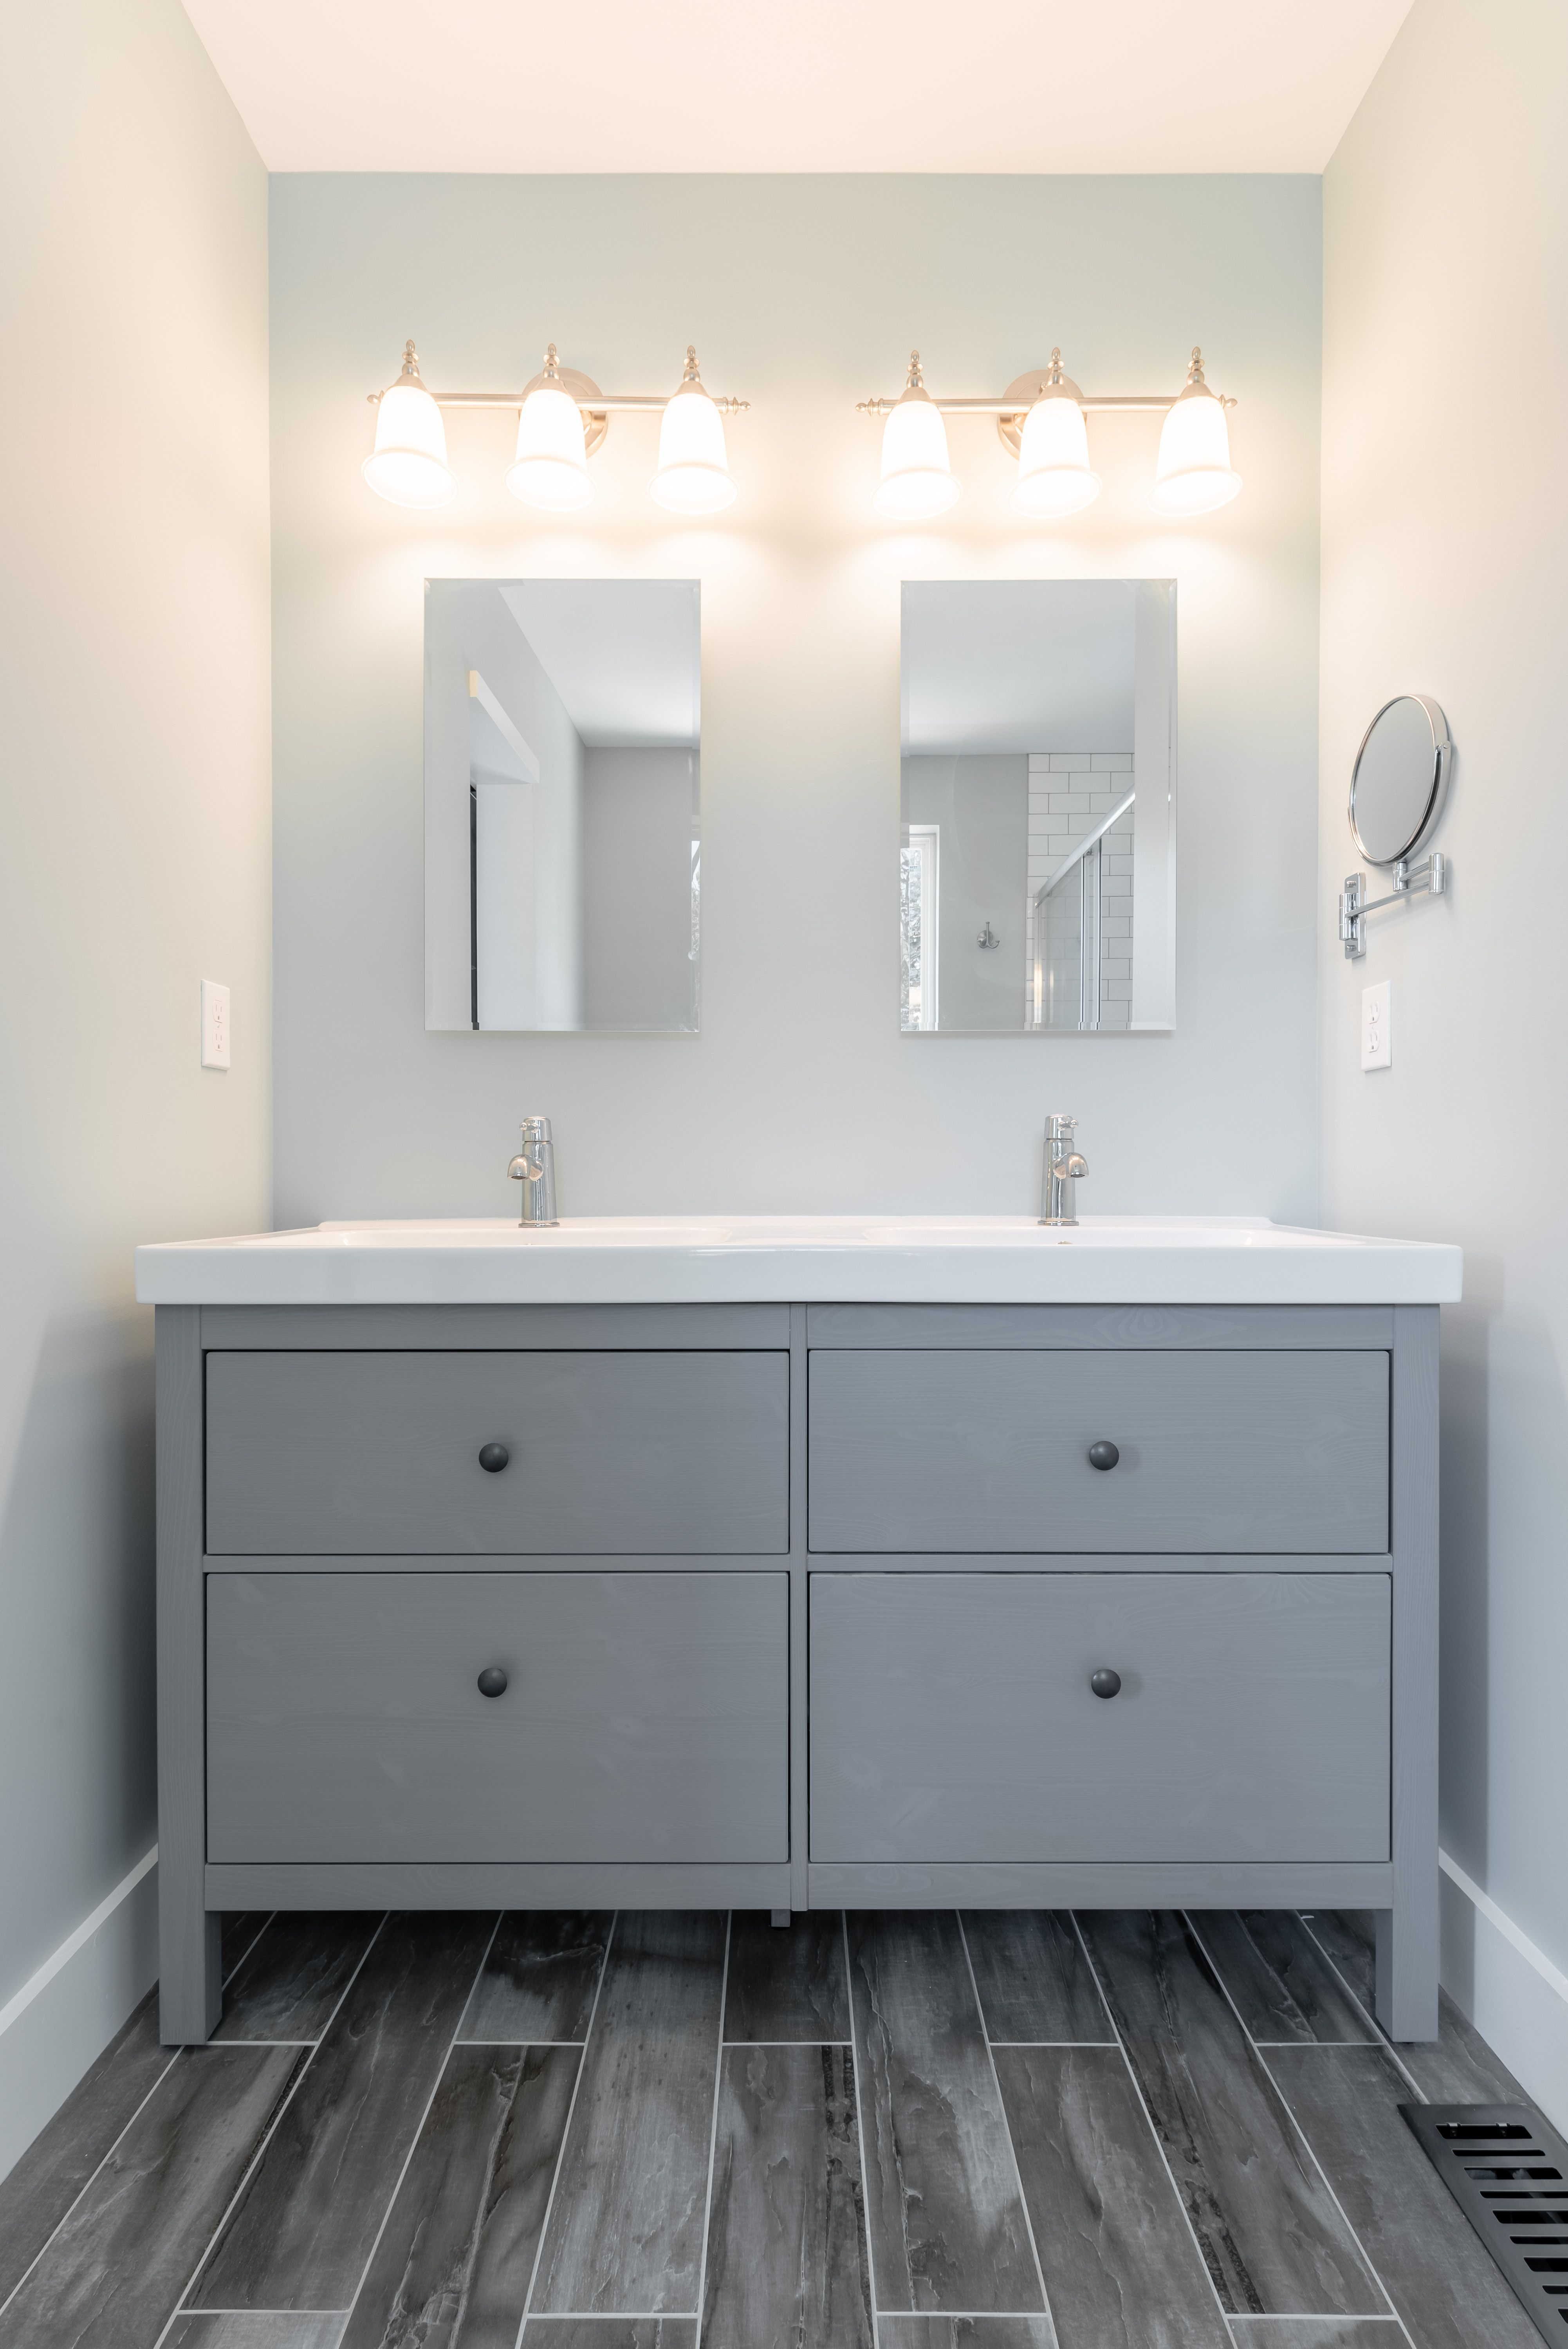 Master Bath Double Vanity Ikea Makeup Vanity Grey Bathroom Vanity Vanity